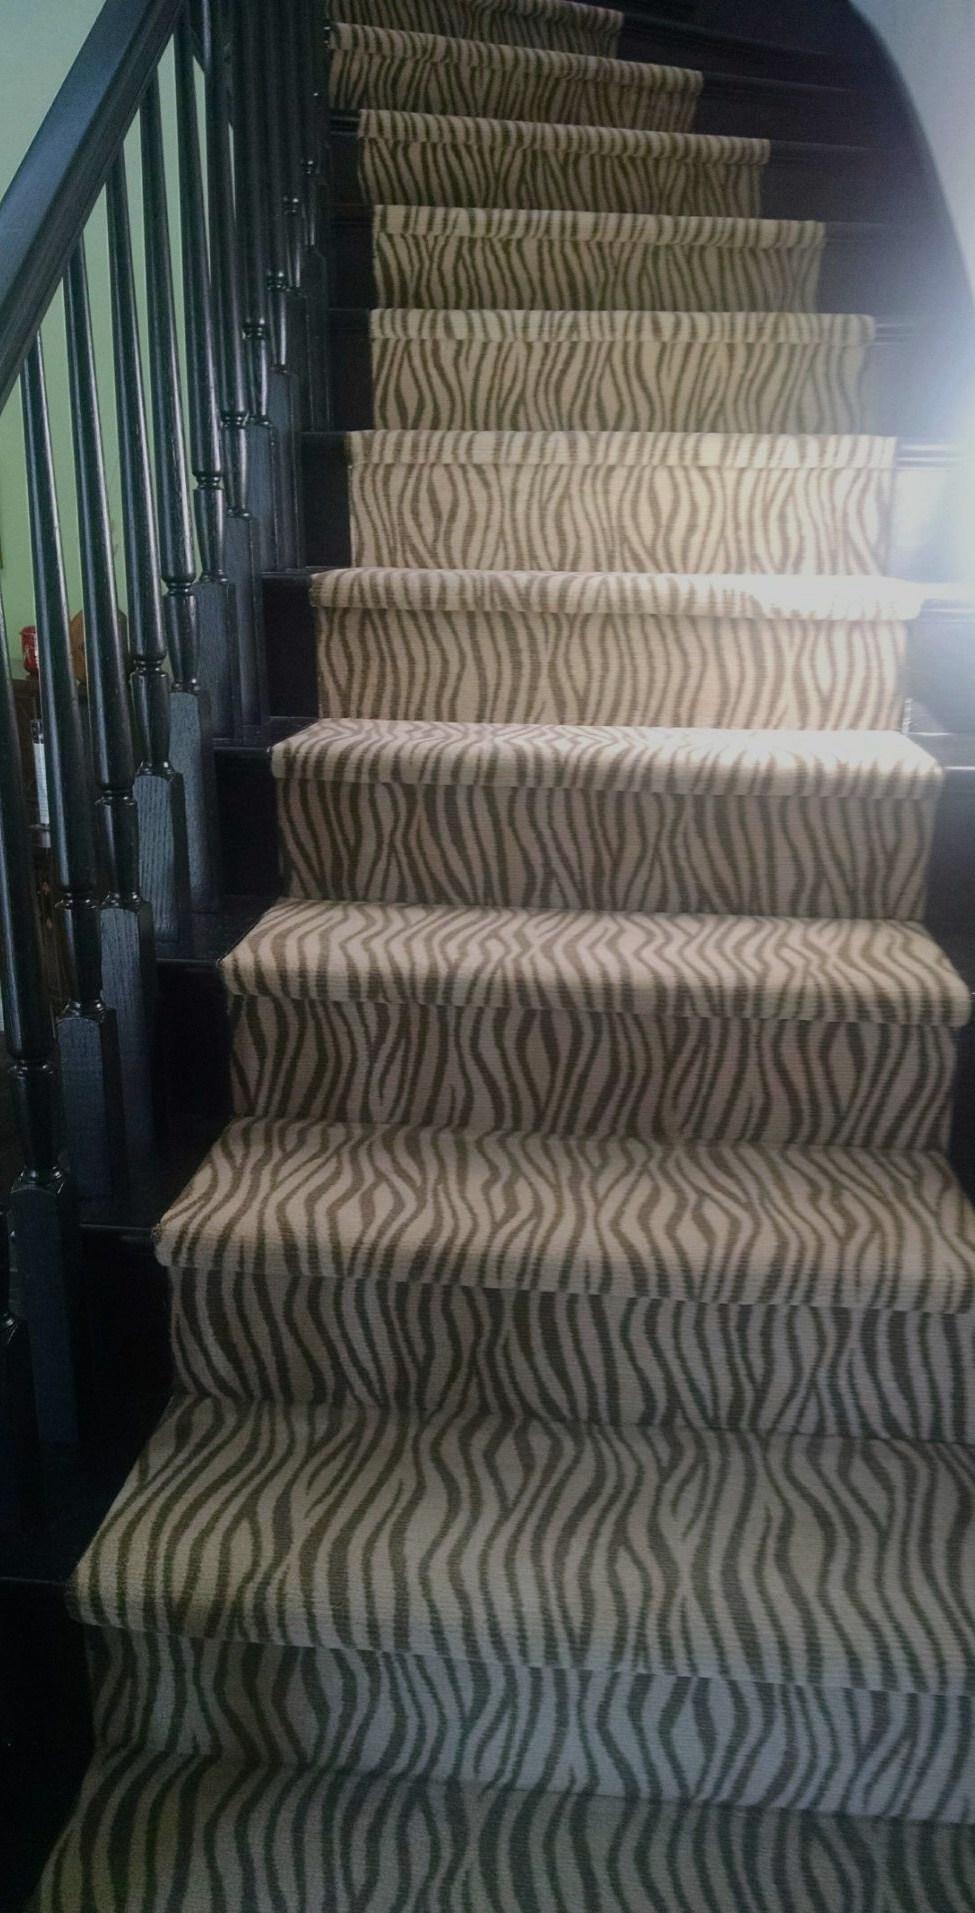 Stanton Hemphill S Rugs Carpets Portfolio | Nylon Carpet For Stairs | Berber Carpet | Non Slip | Tread Covers | Rug | Stairway